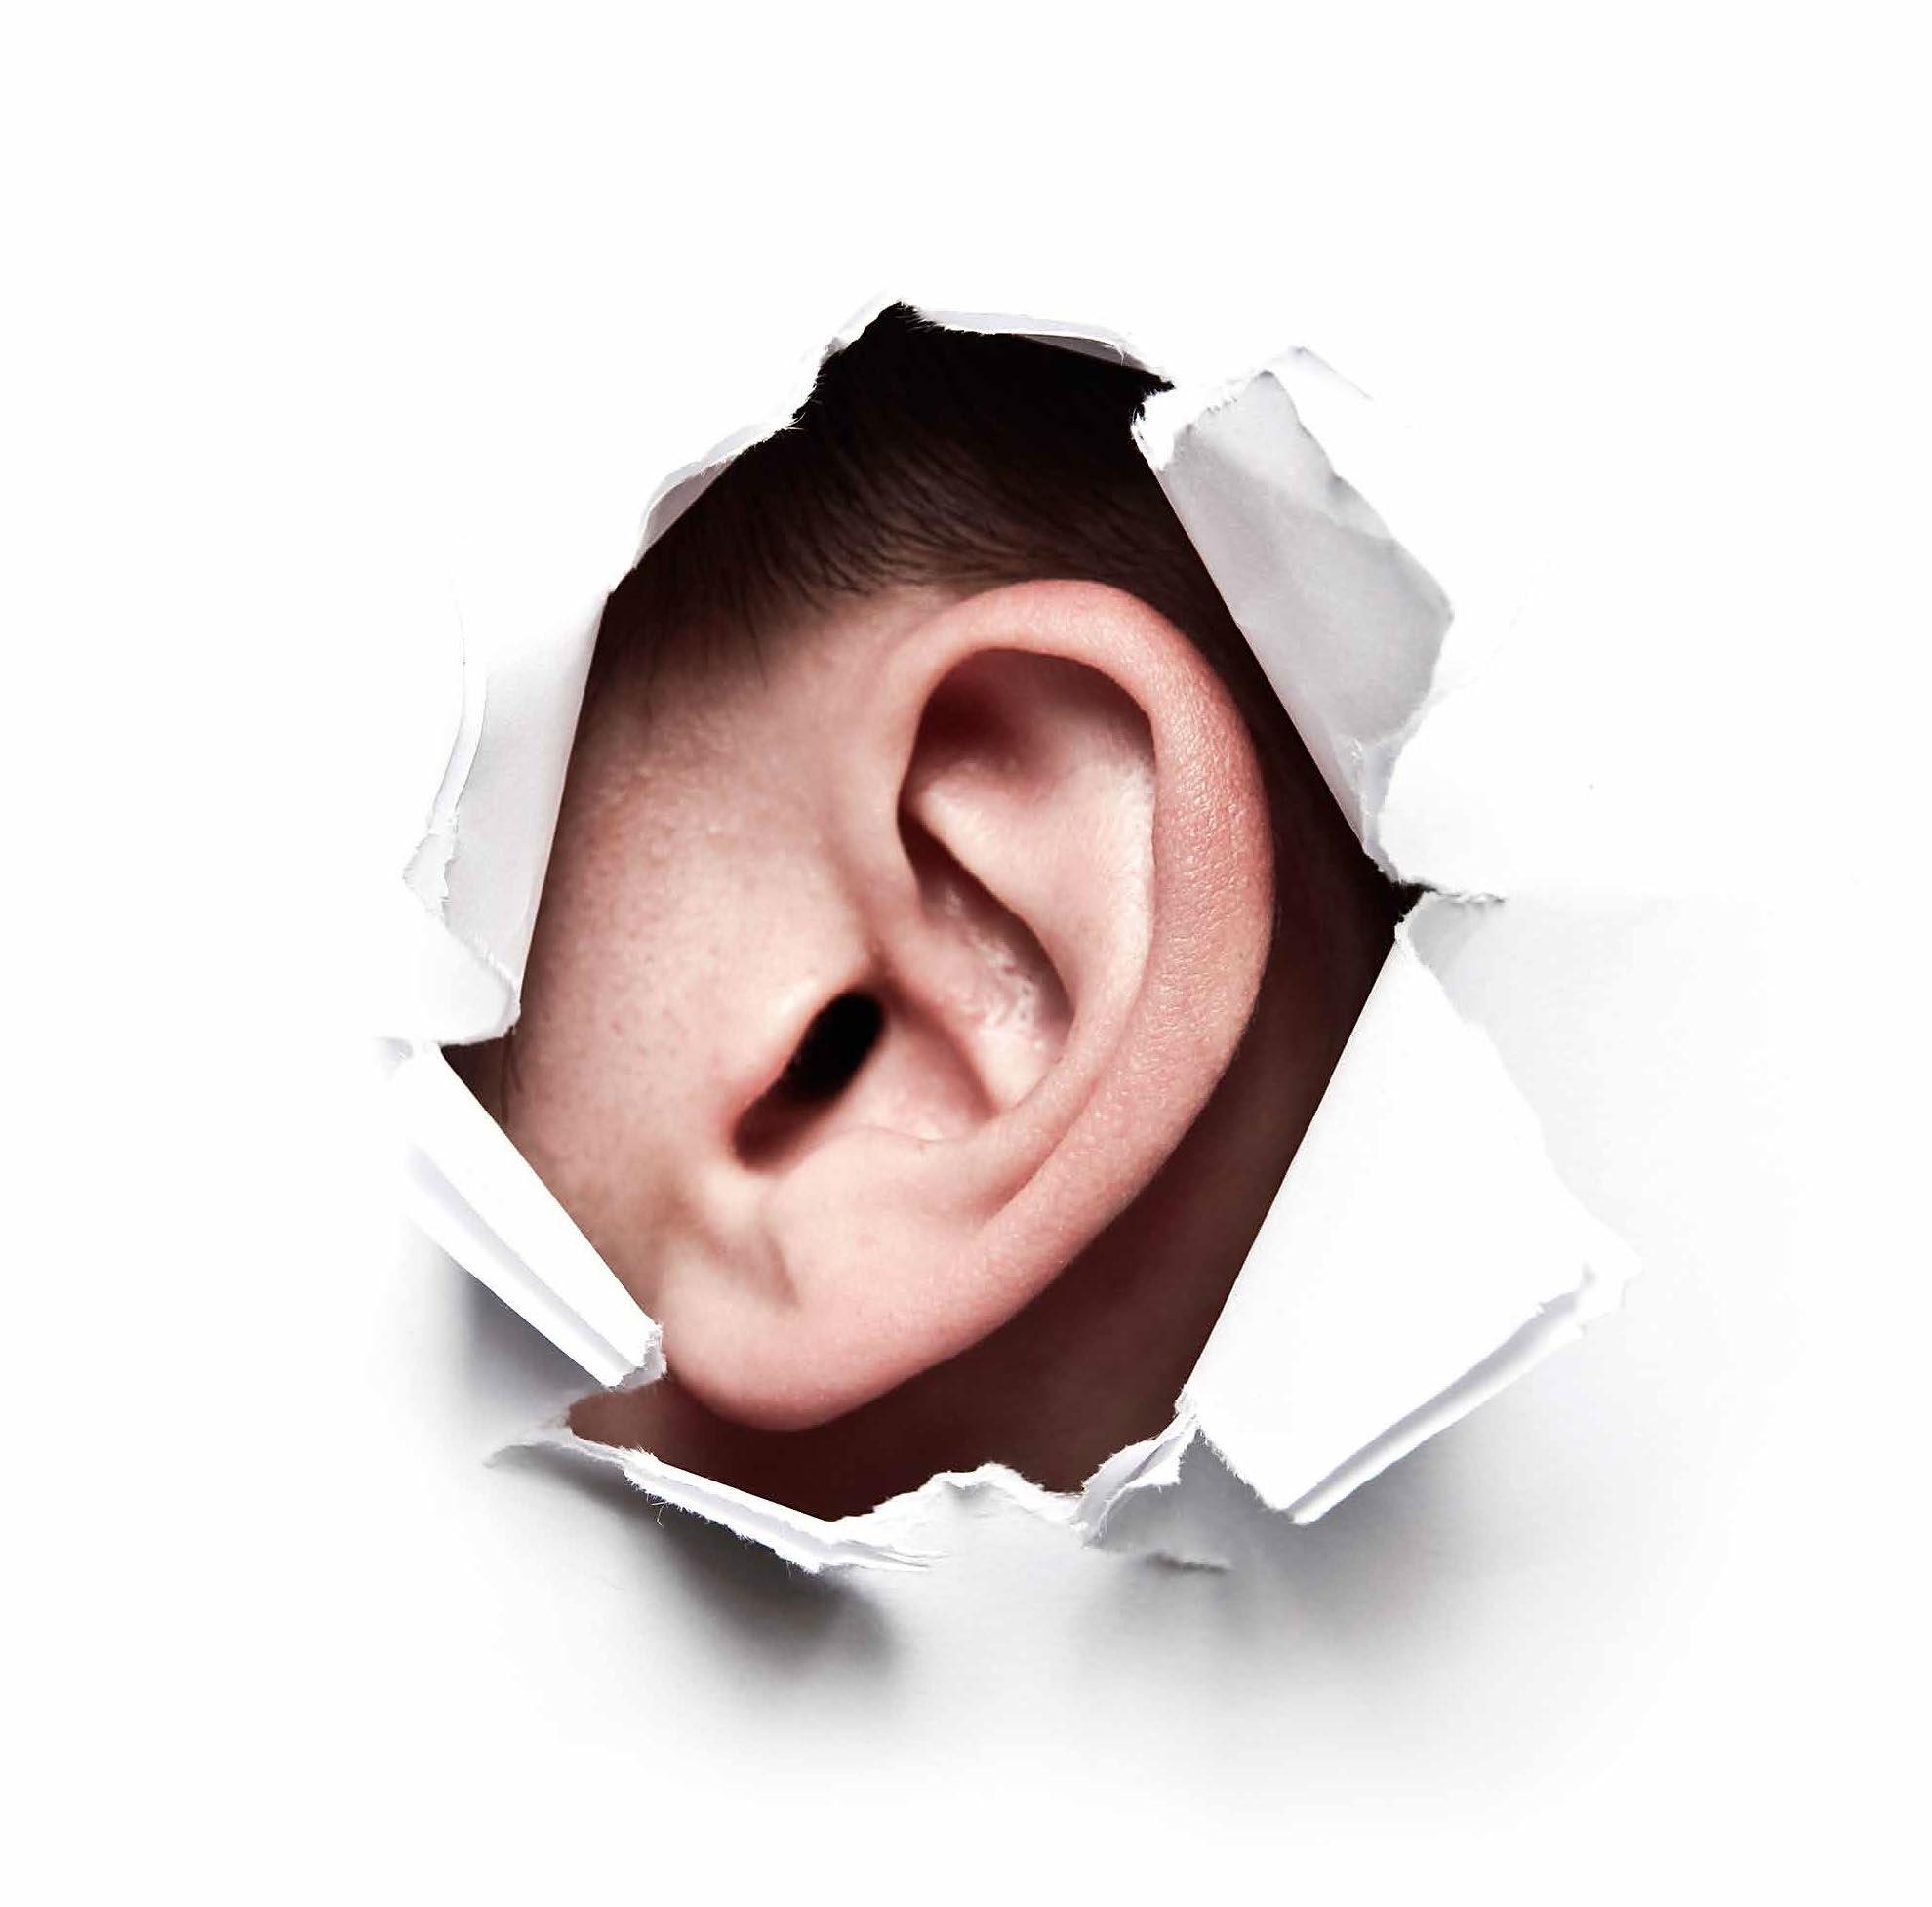 Presbyacousie : Écoutons nos oreilles